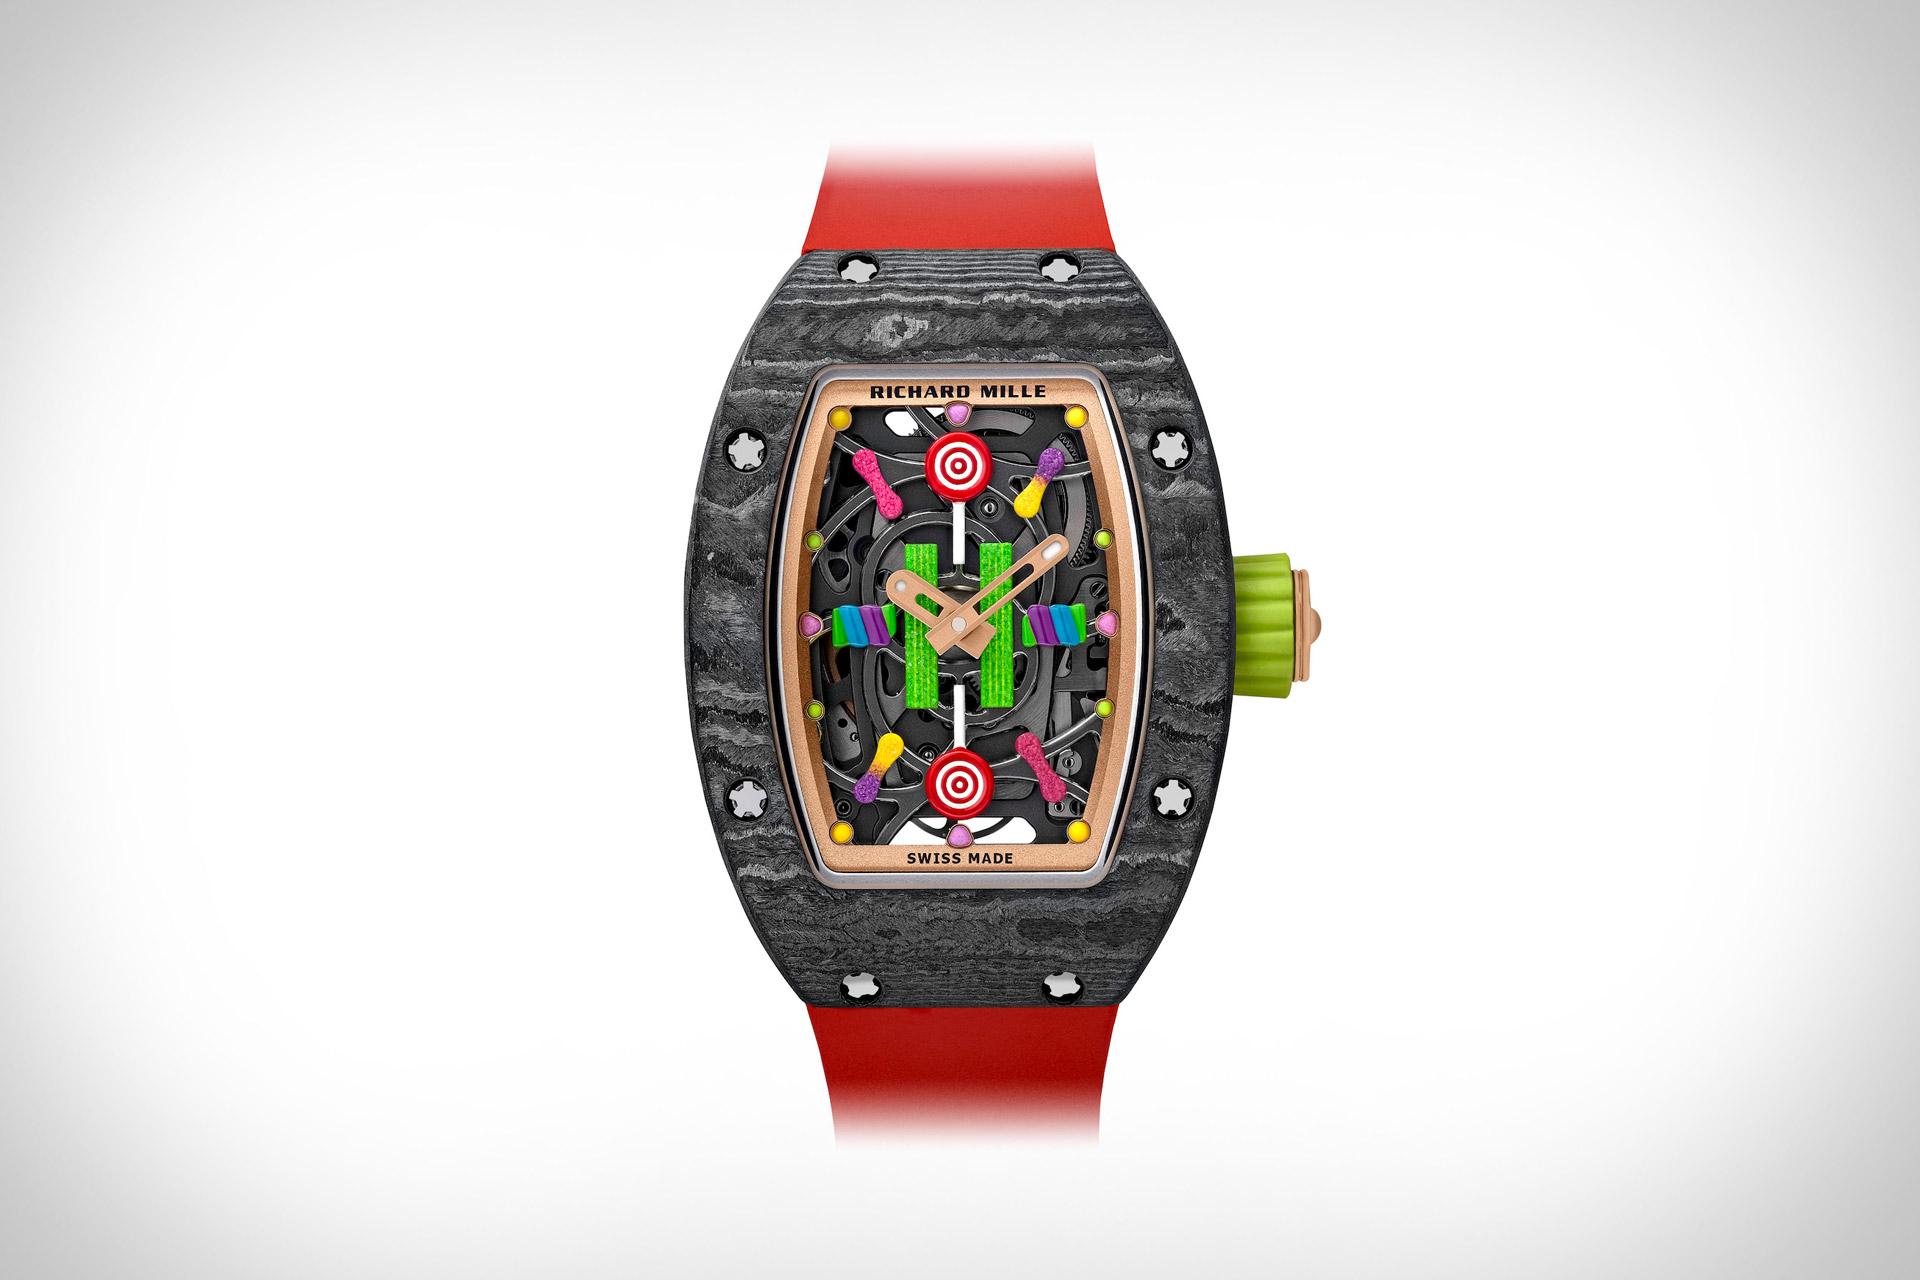 Richard Mille Bonbon Watch Collection